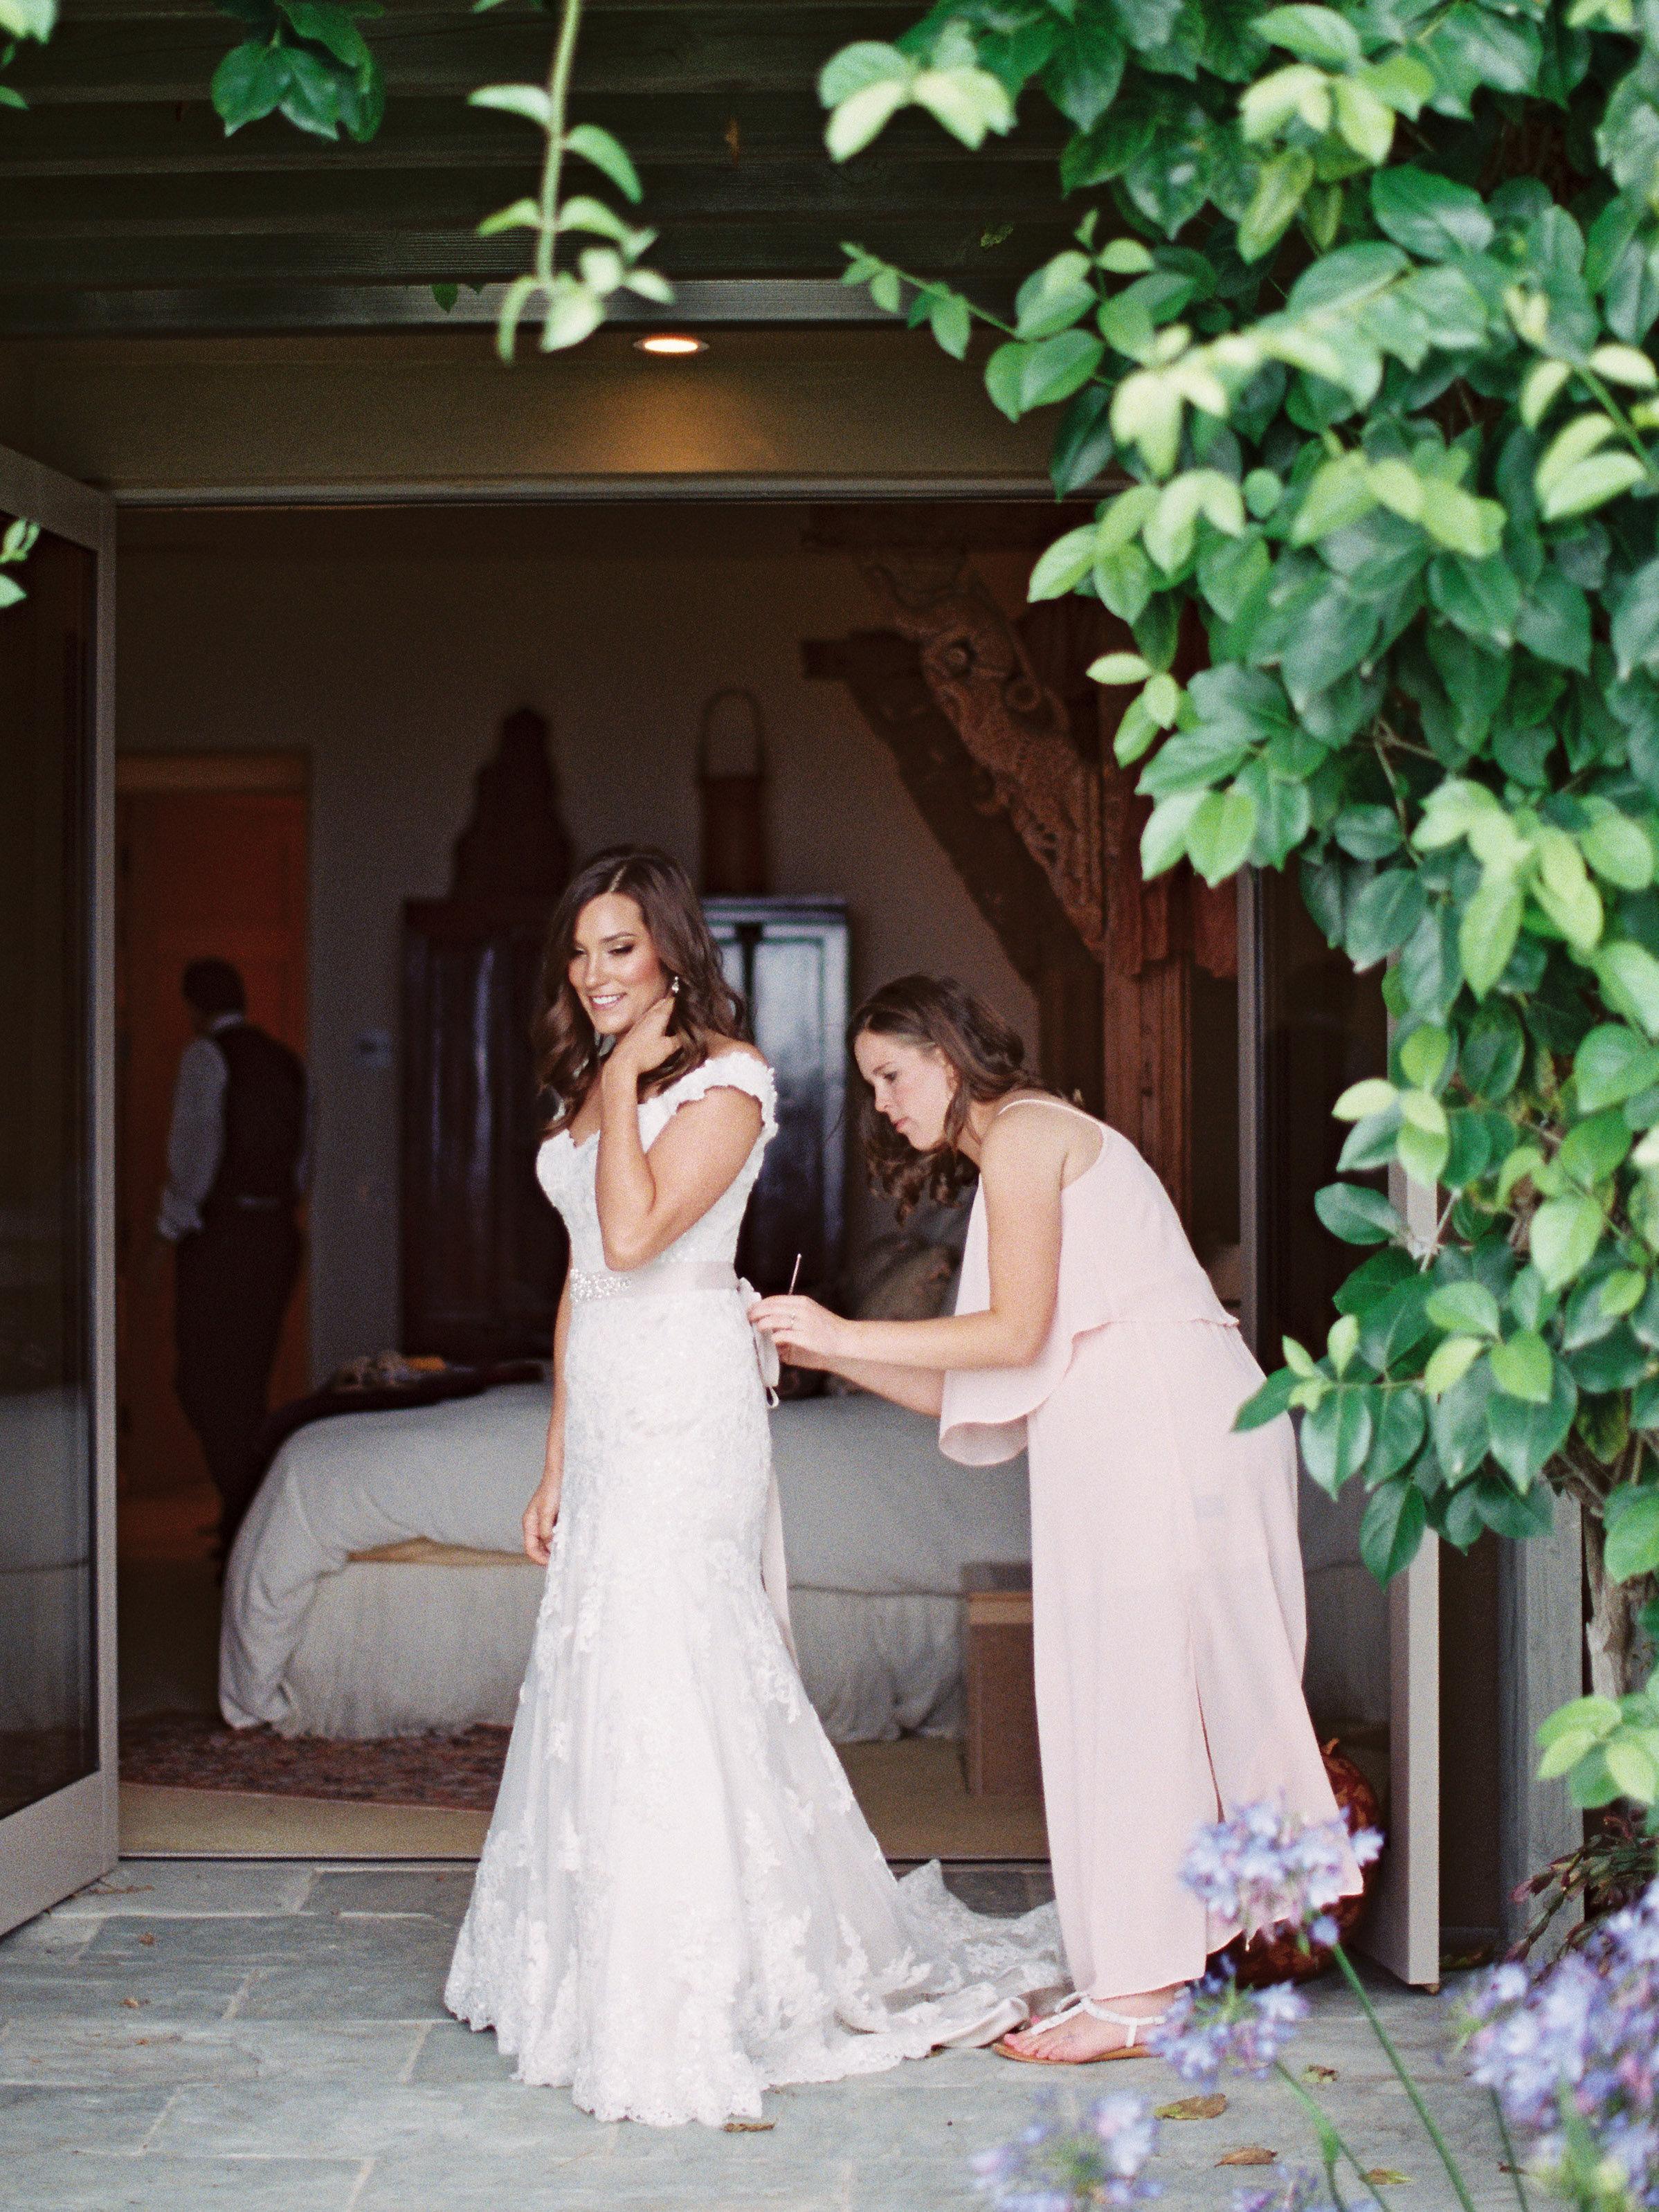 santabarbarawedding.com | photo:Jeremiah and Rachel Photography | Real wedding at the Belmond El Encanto